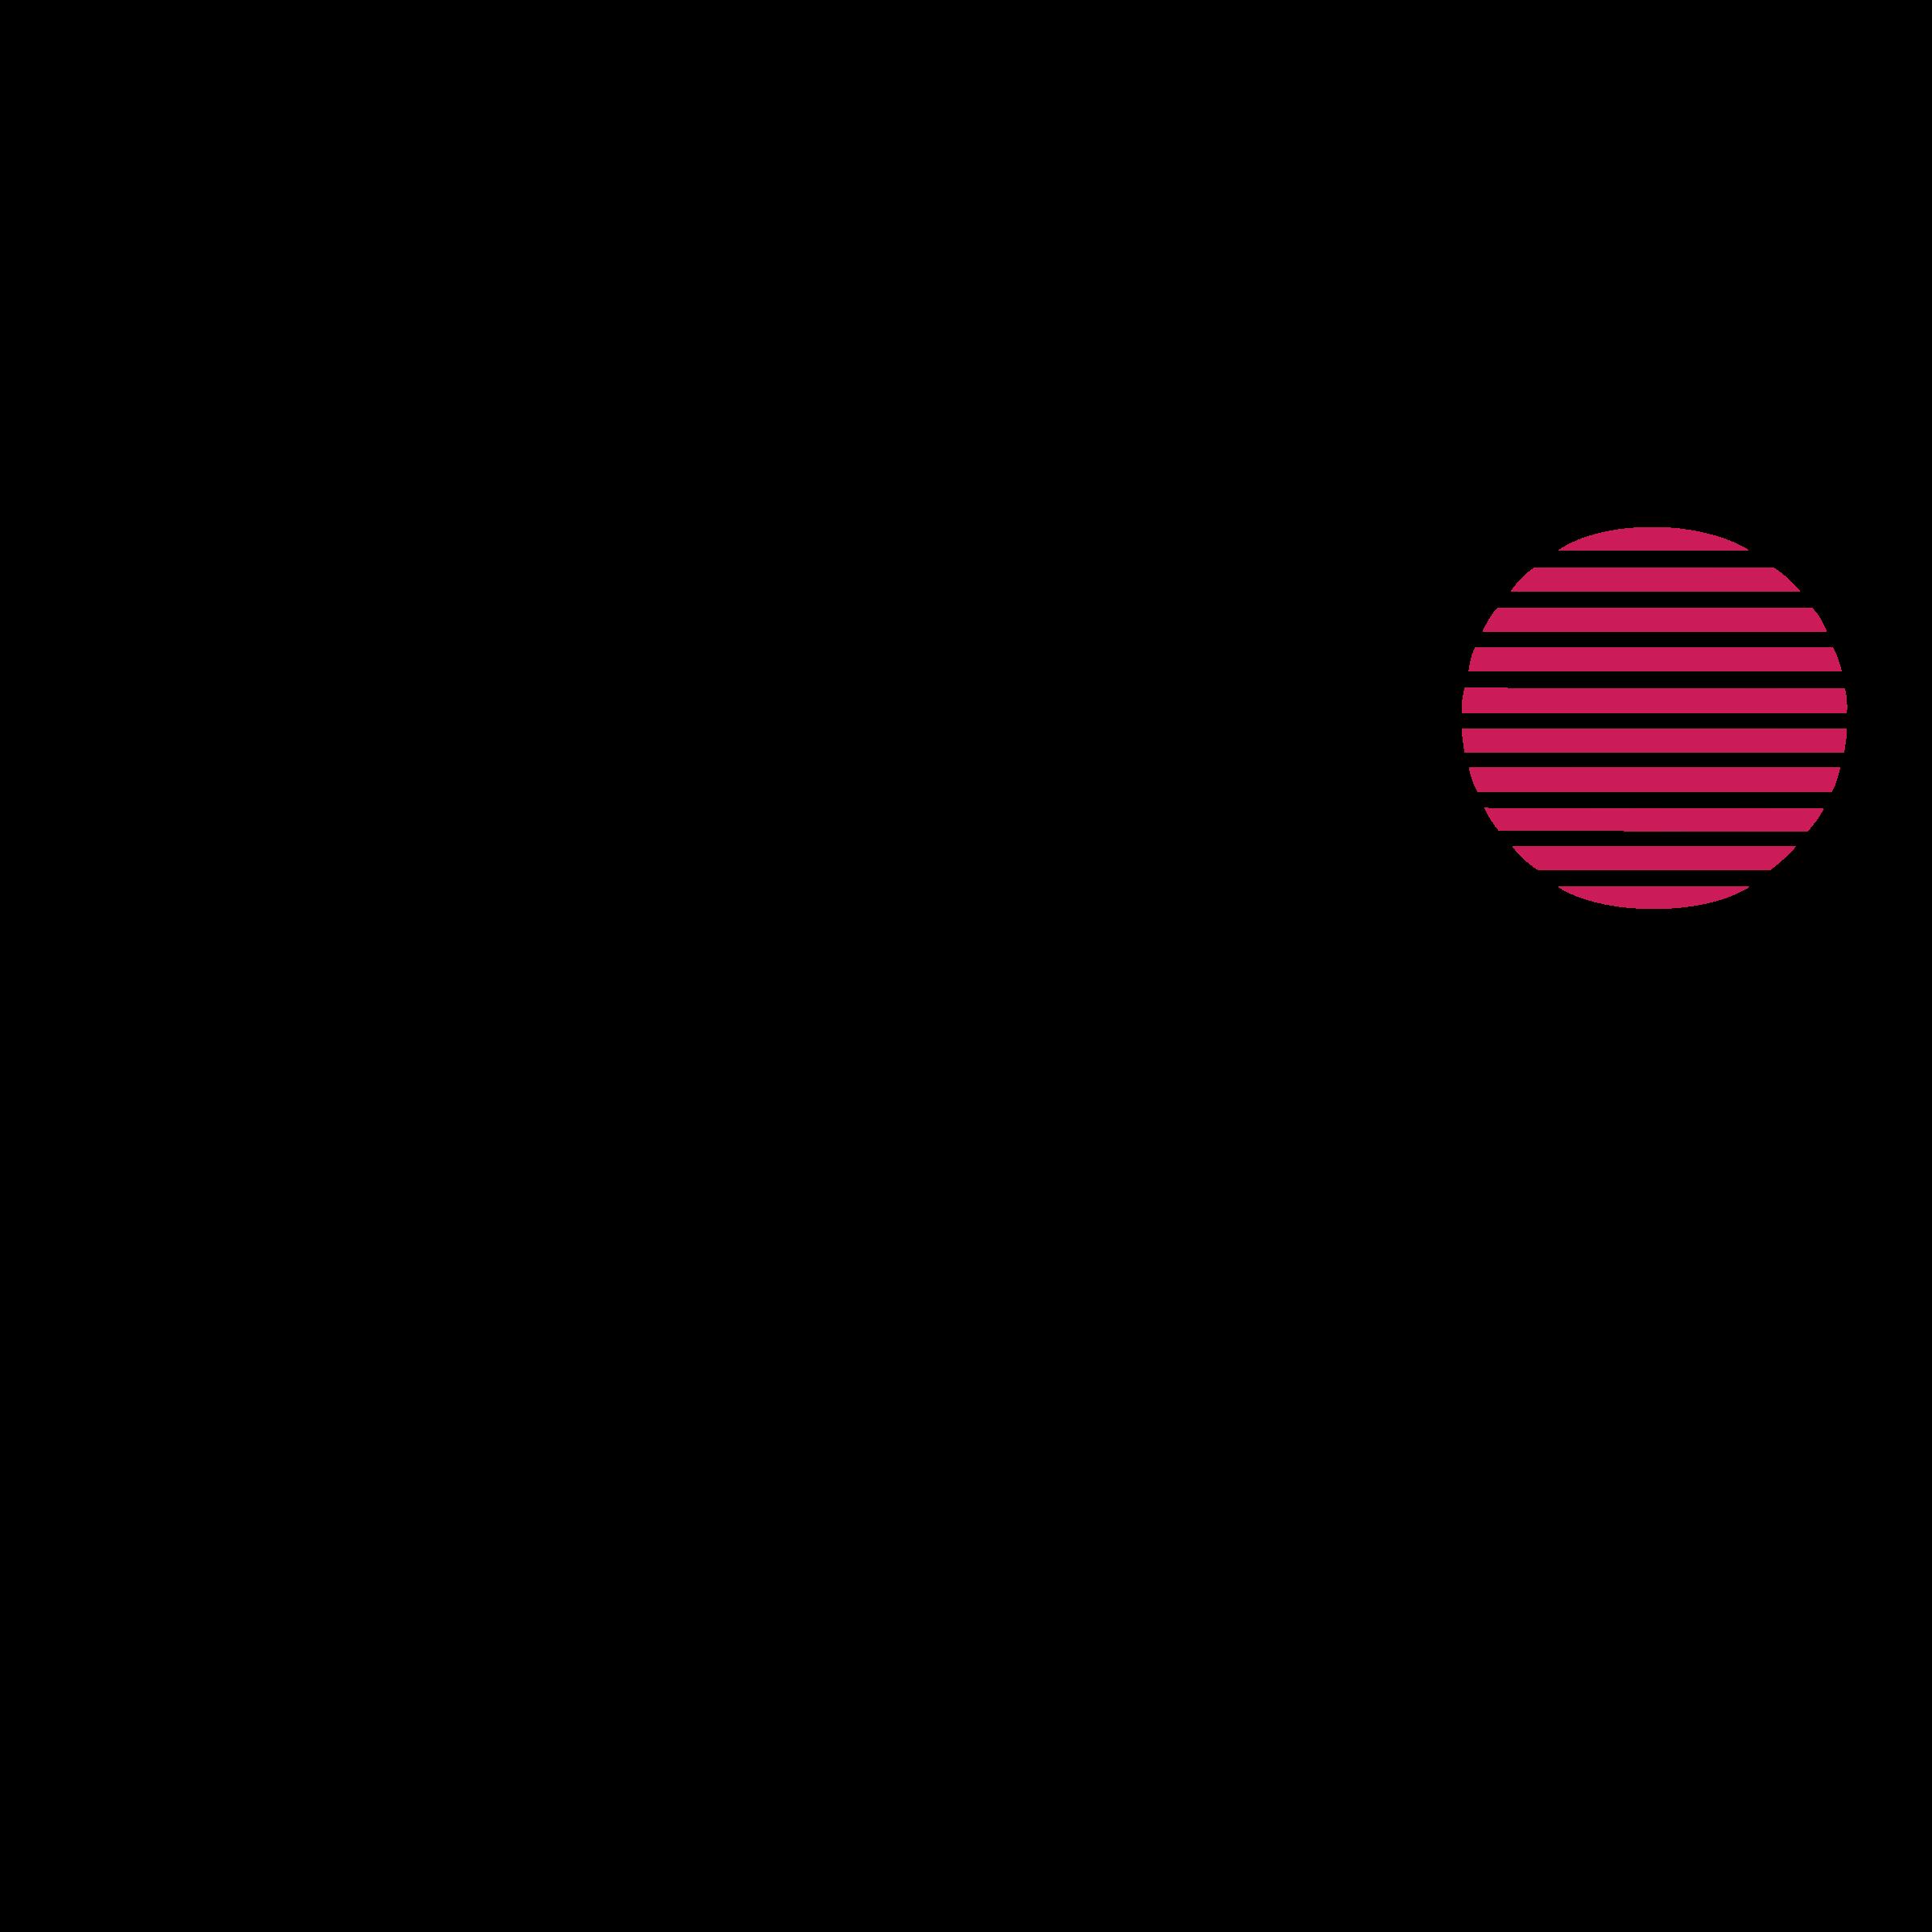 allied-telesis-logo-png-transparent